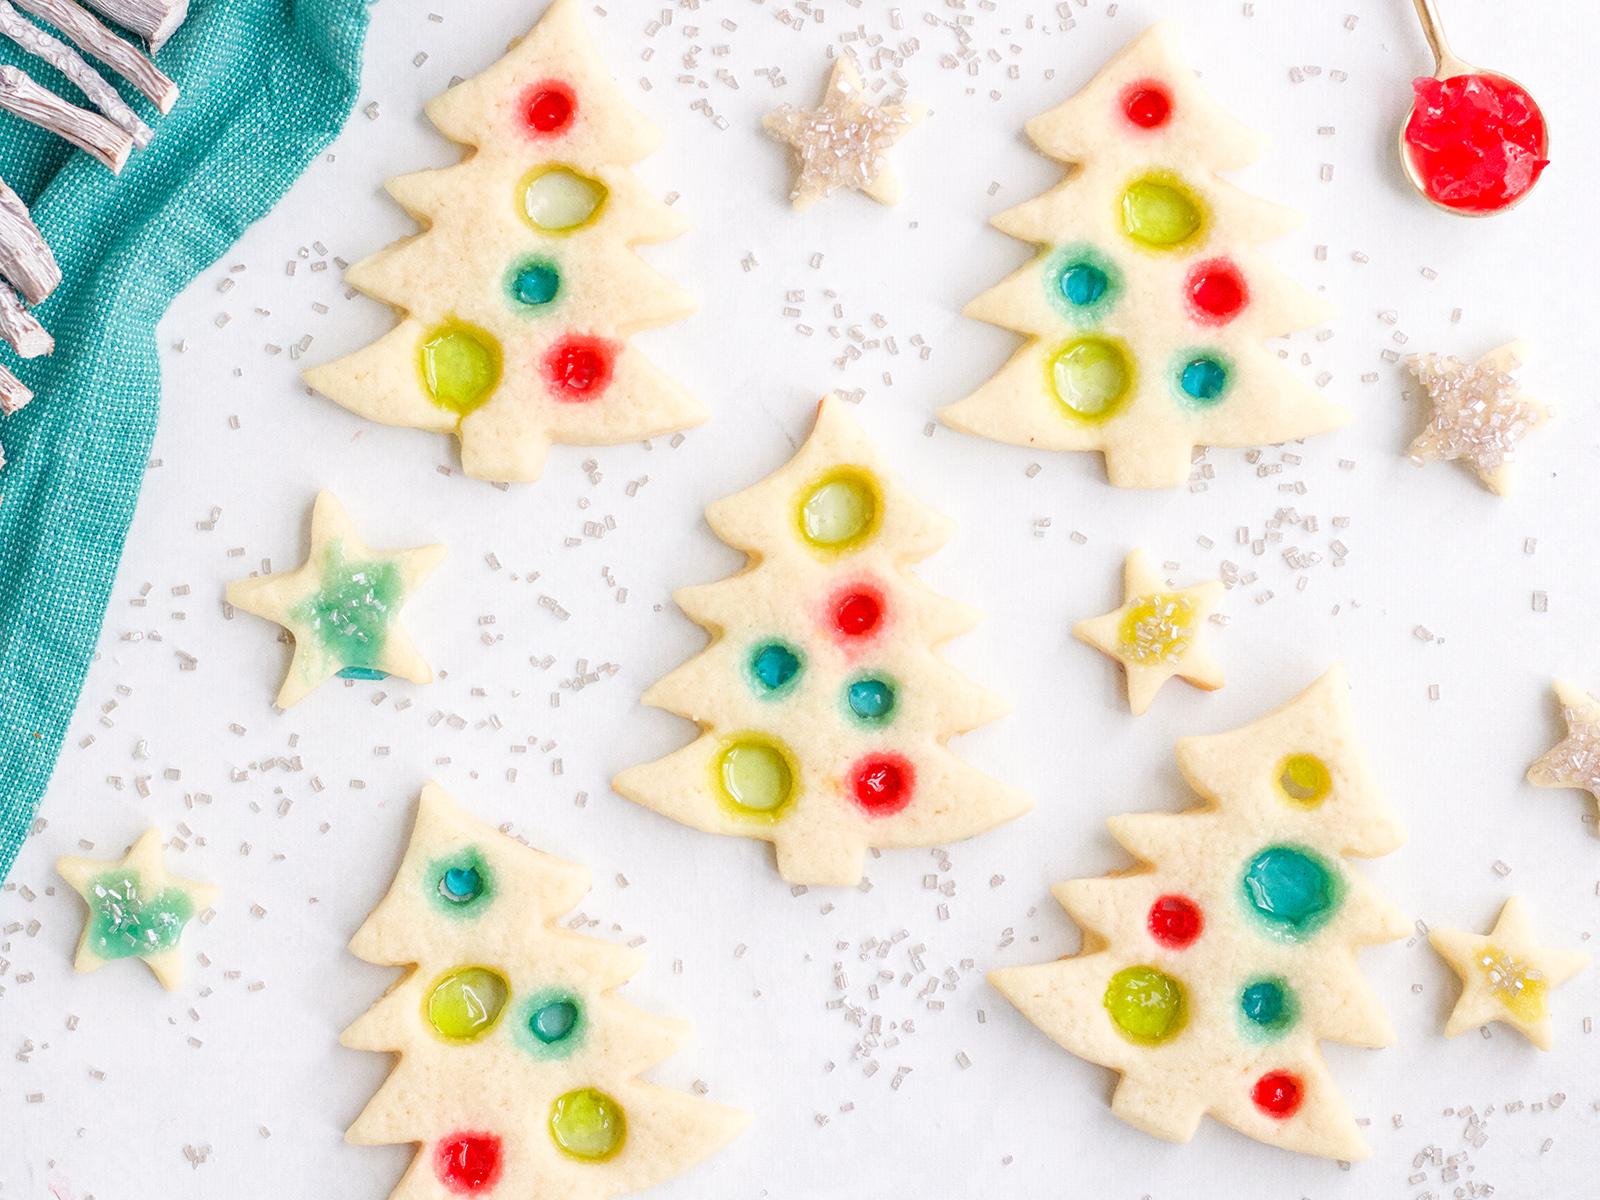 Best Cookies for Christmas Cookie Platters